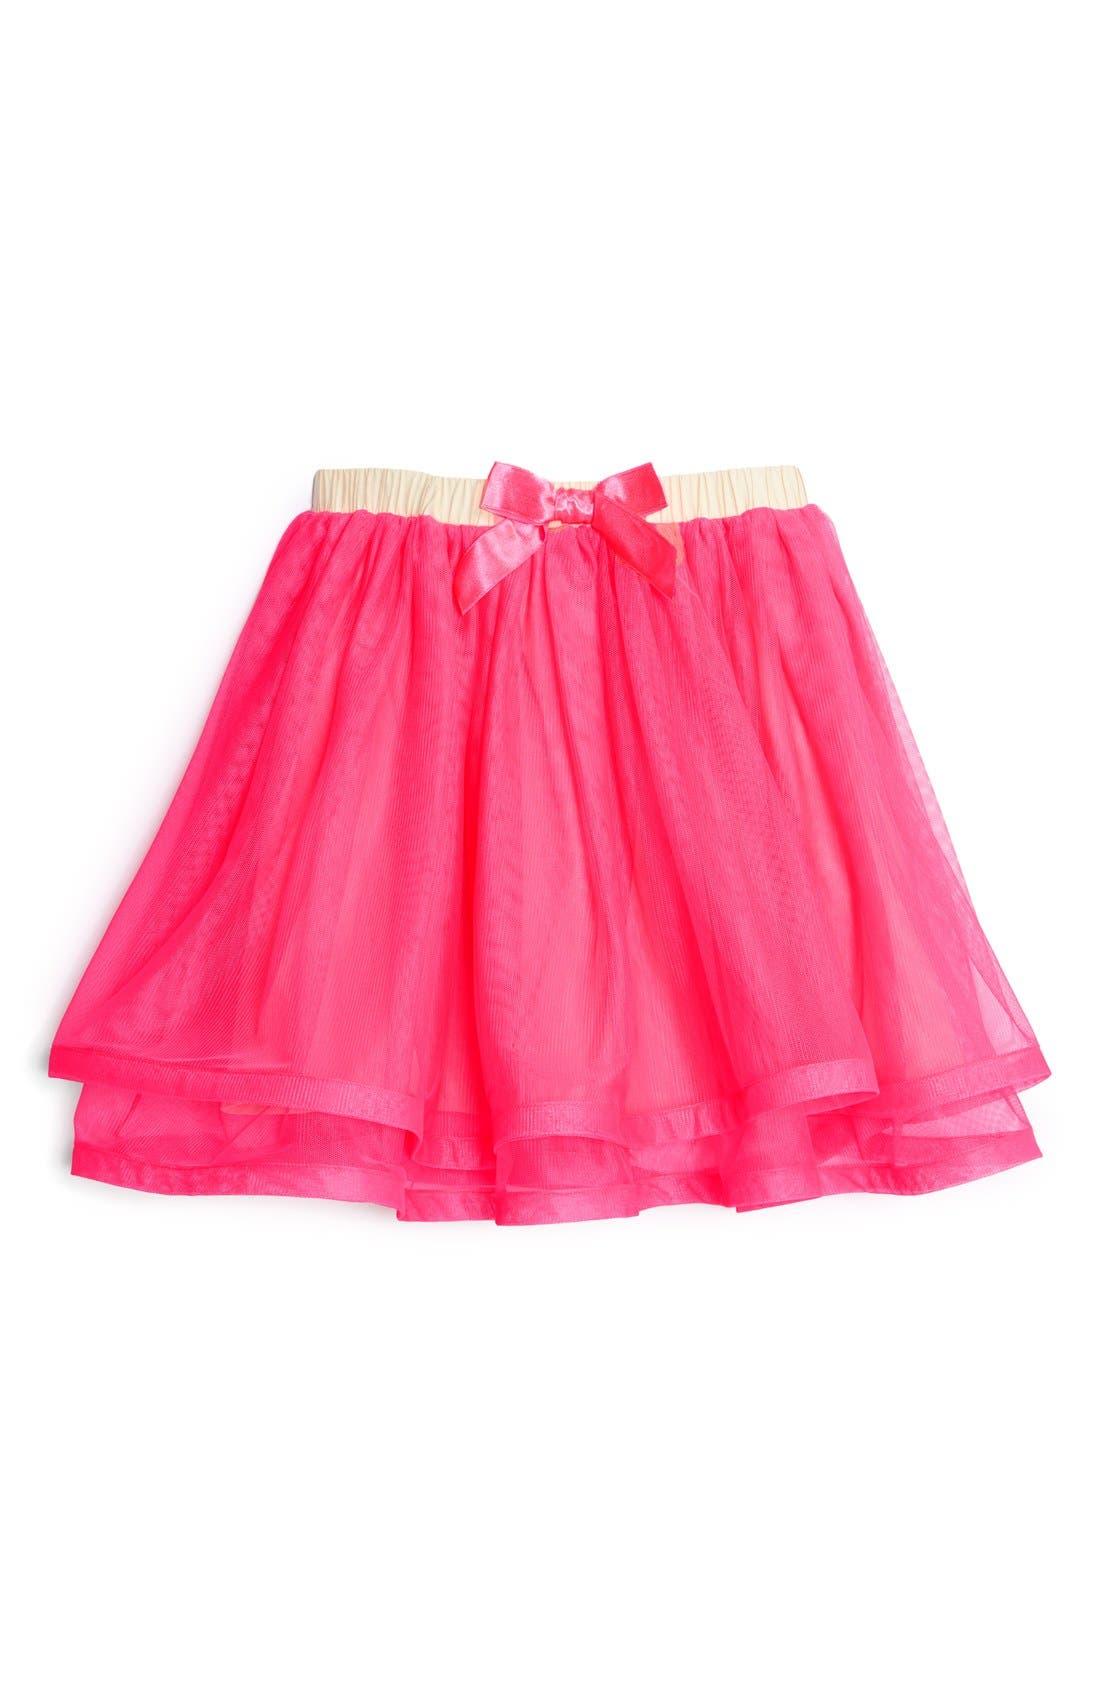 Alternate Image 1 Selected - Billieblush Tutu Skirt (Toddler Girls, Little Girls & Big Girls)